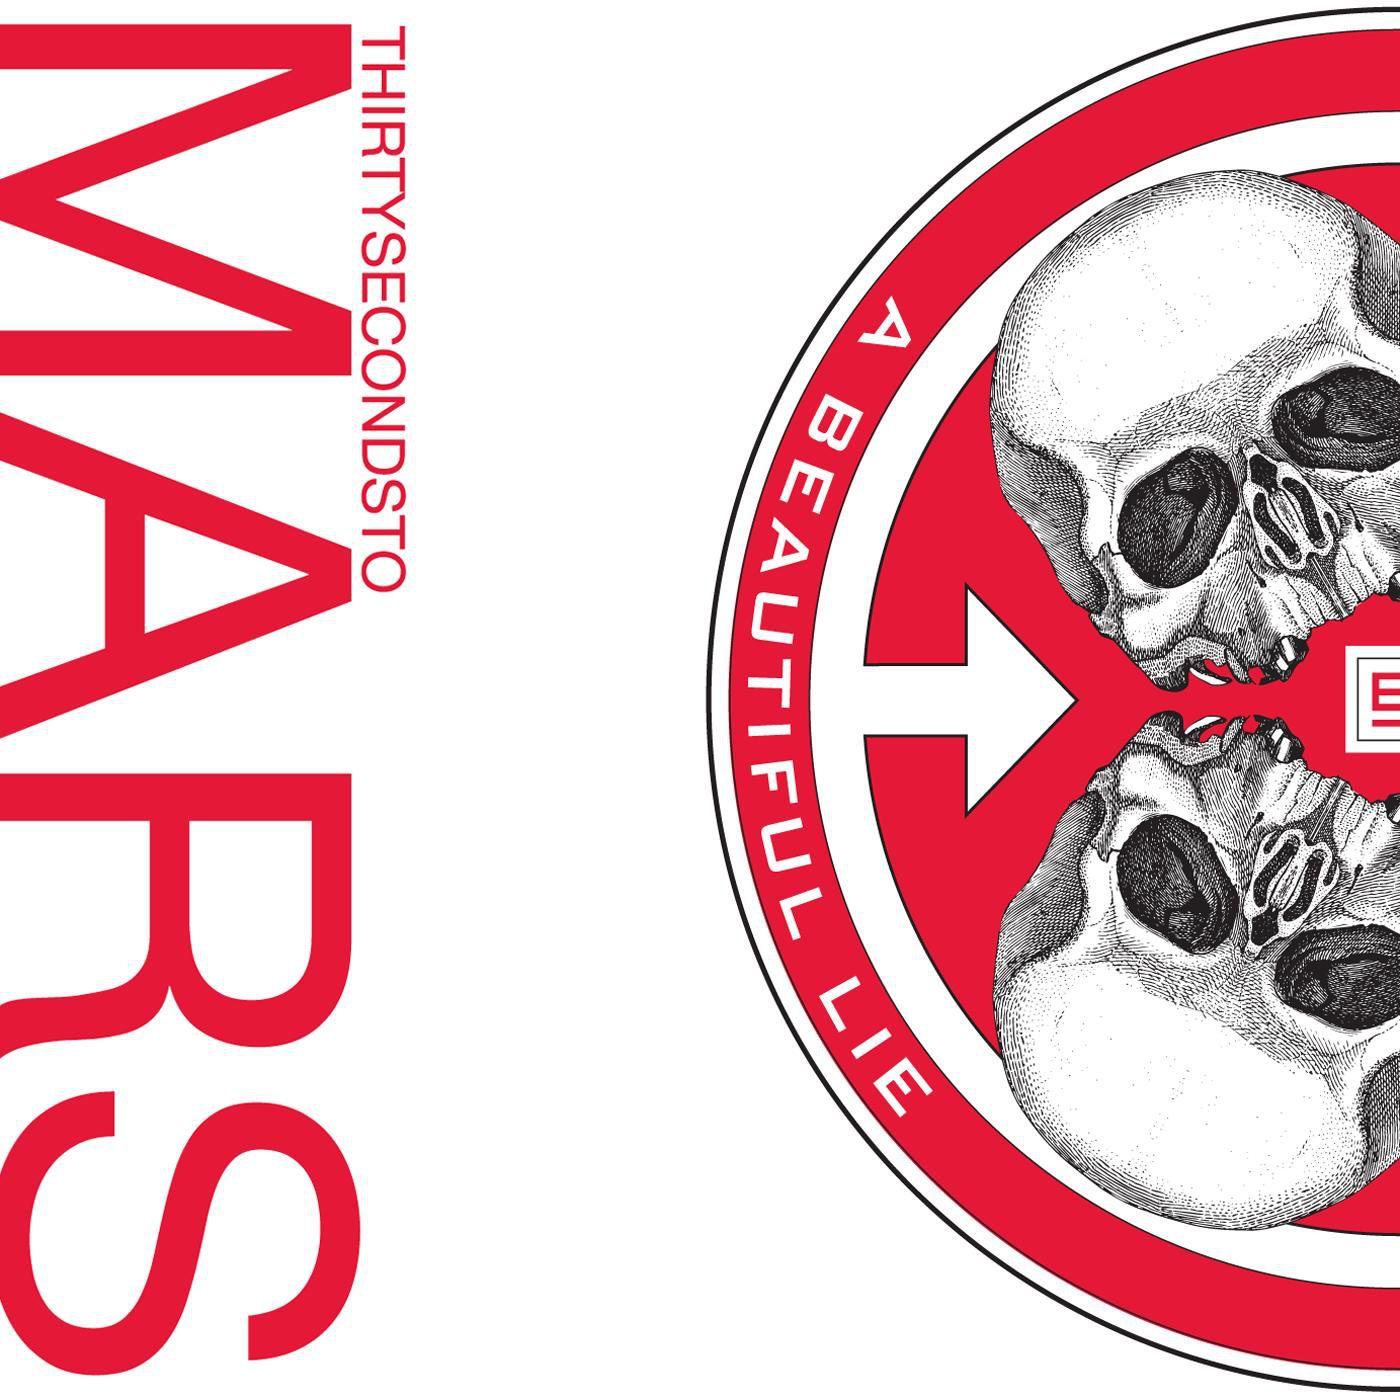 30 Seconds To Mars - A Beautiful Lie album cover